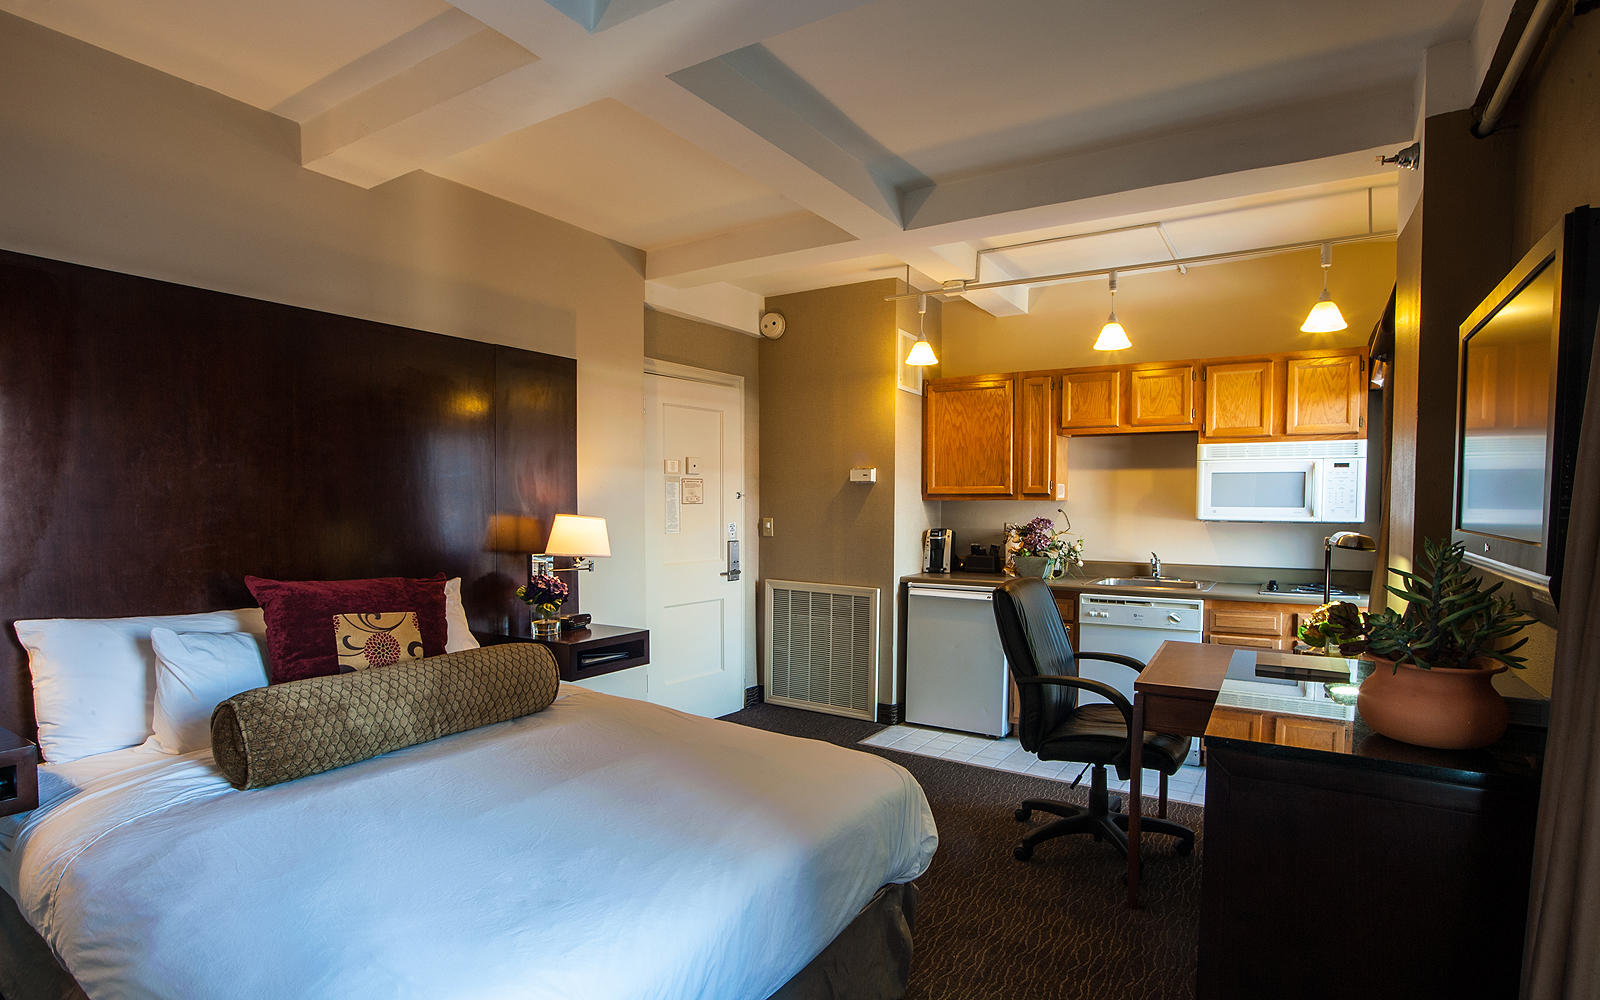 Jefferson Clinton Hotel Reviews